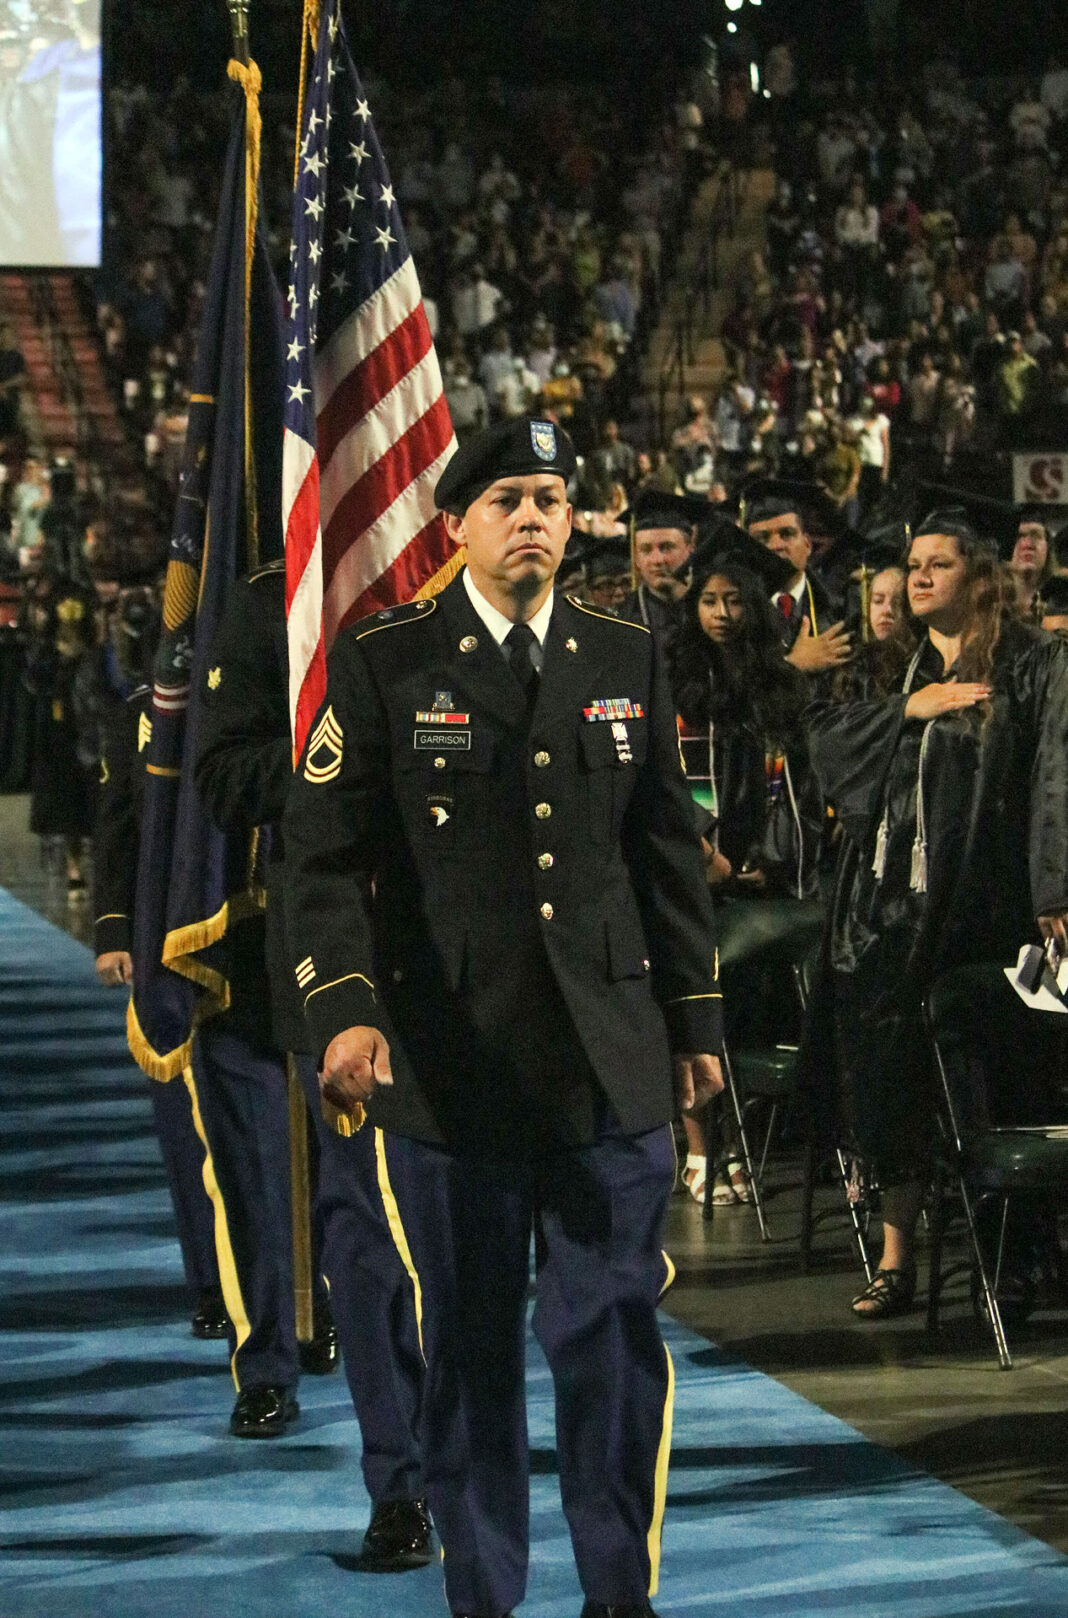 National Guard walks past SLCC graduates